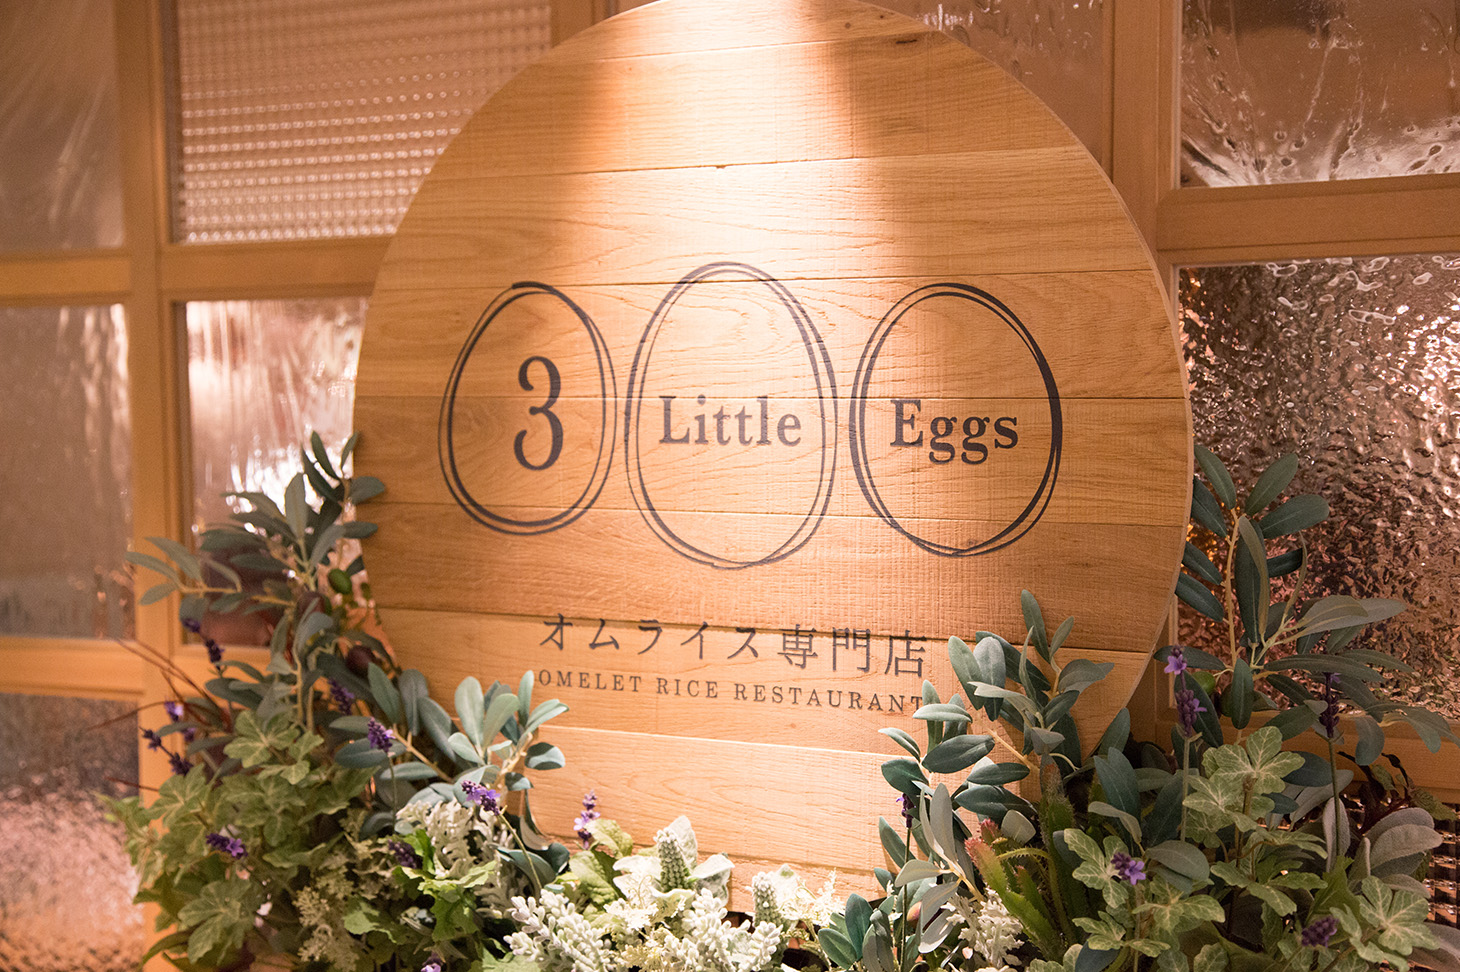 3 Little Eggs - 店舗外観ロゴ